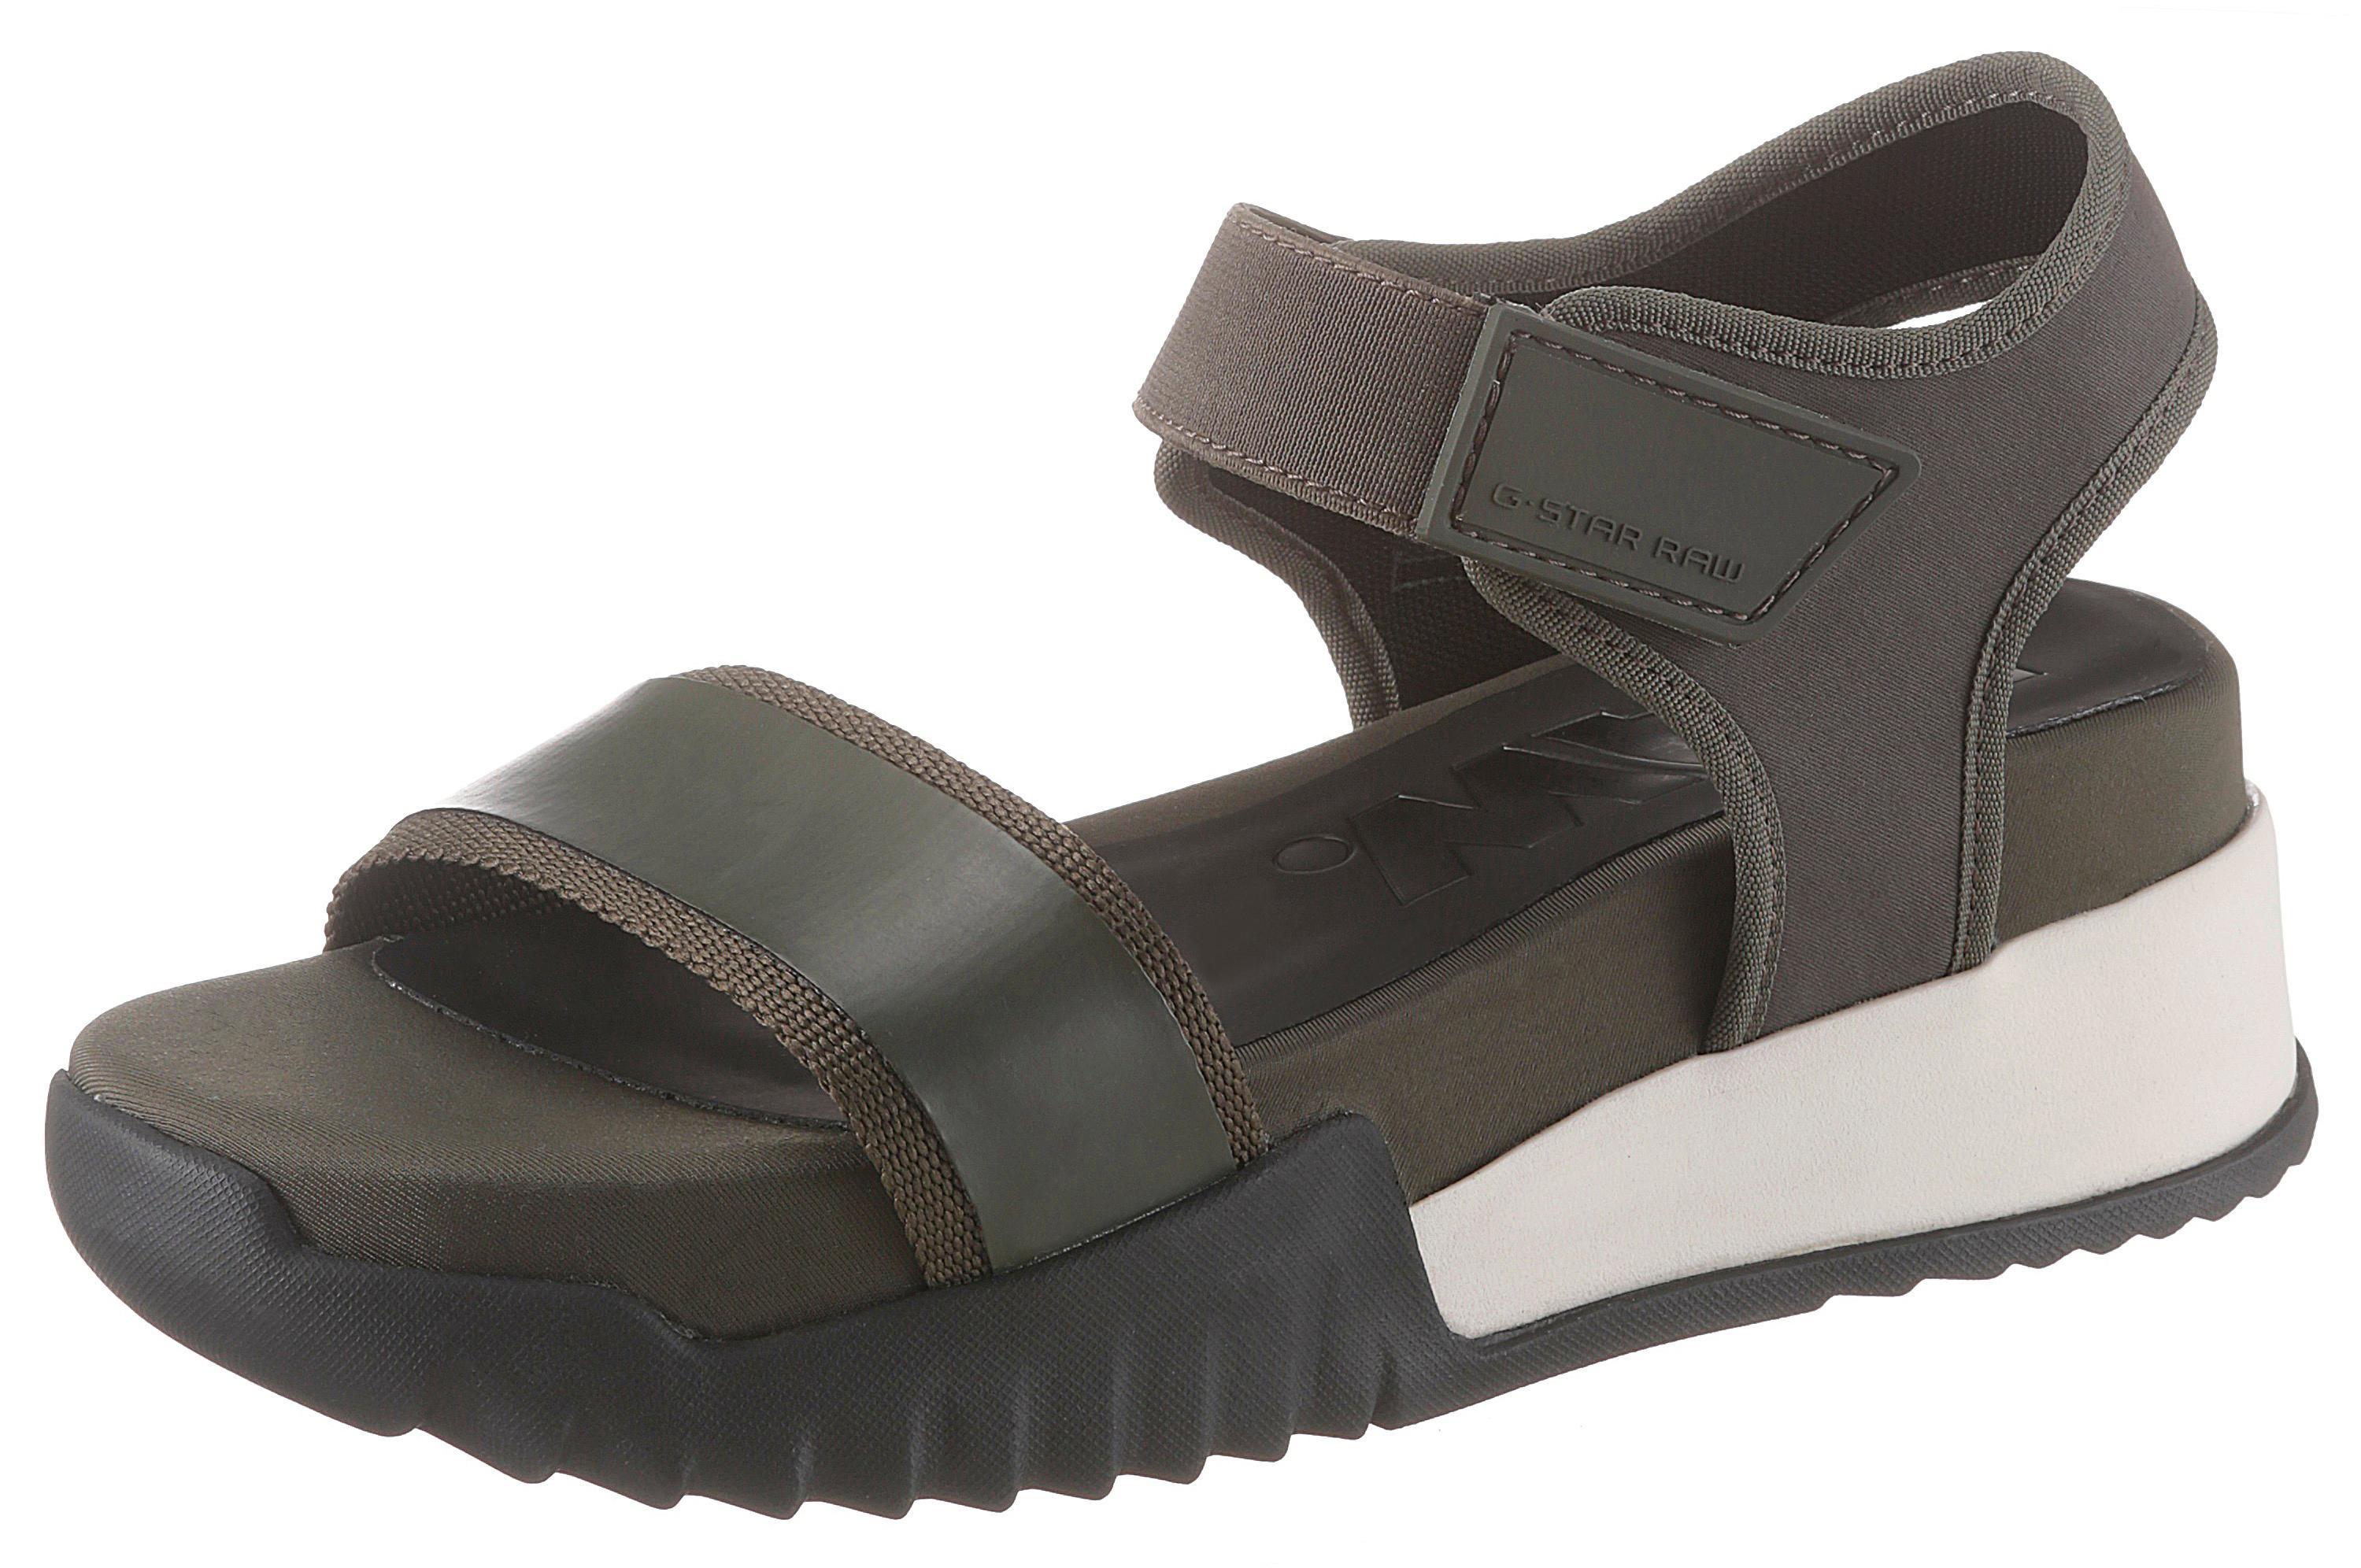 G-Star RAW Sandale Rackam Rovic Sandal Damenmode/Schuhe/Sandalen/Keilsandalen